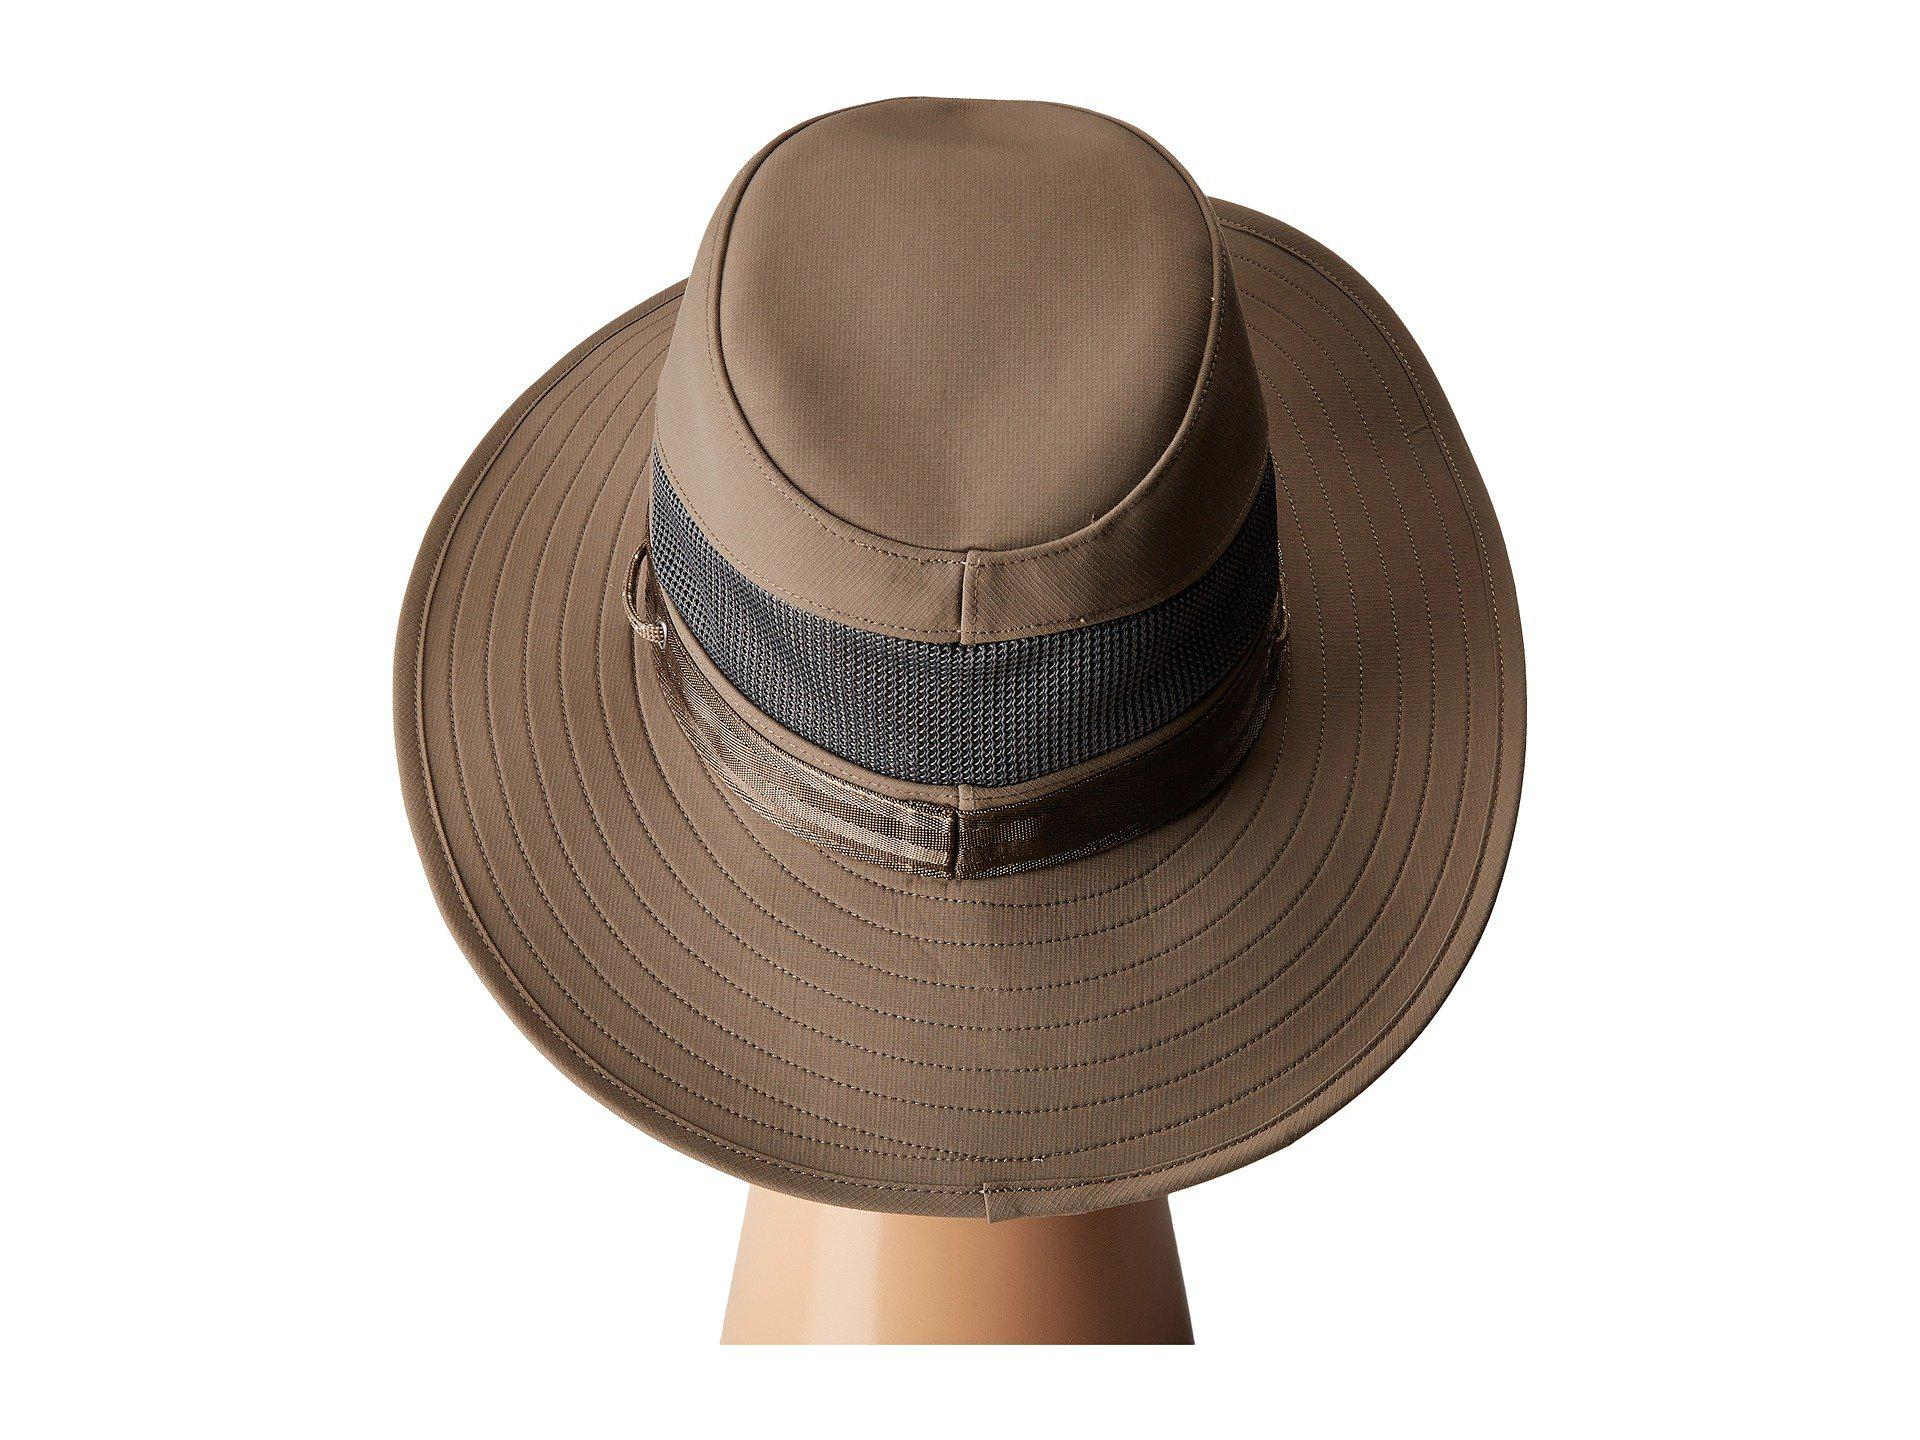 e99435f52 Men's Shadowcaster Hat (weimaraner Brown/asphalt Grey) Bucket Caps